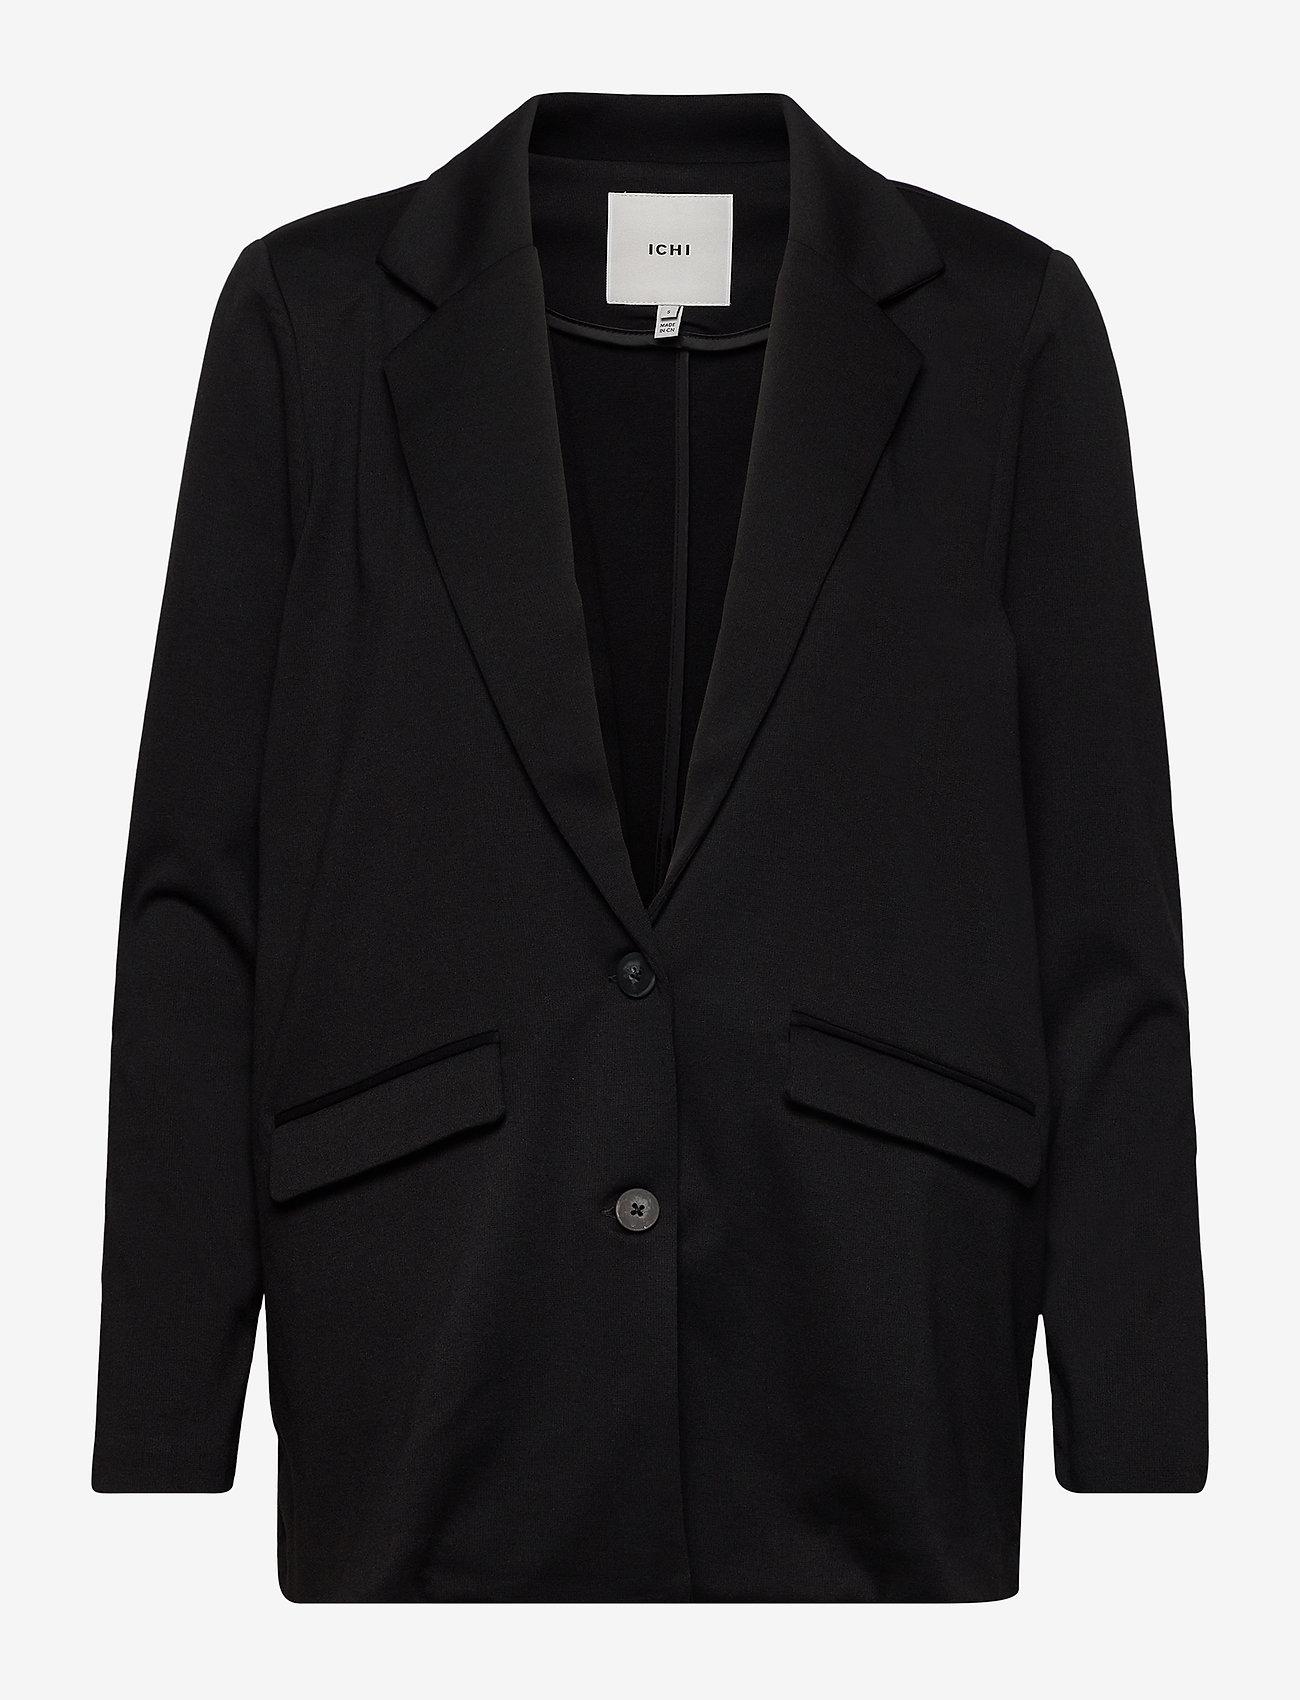 ICHI - IHKATE LONG BL2 - oversize blazers - black - 0